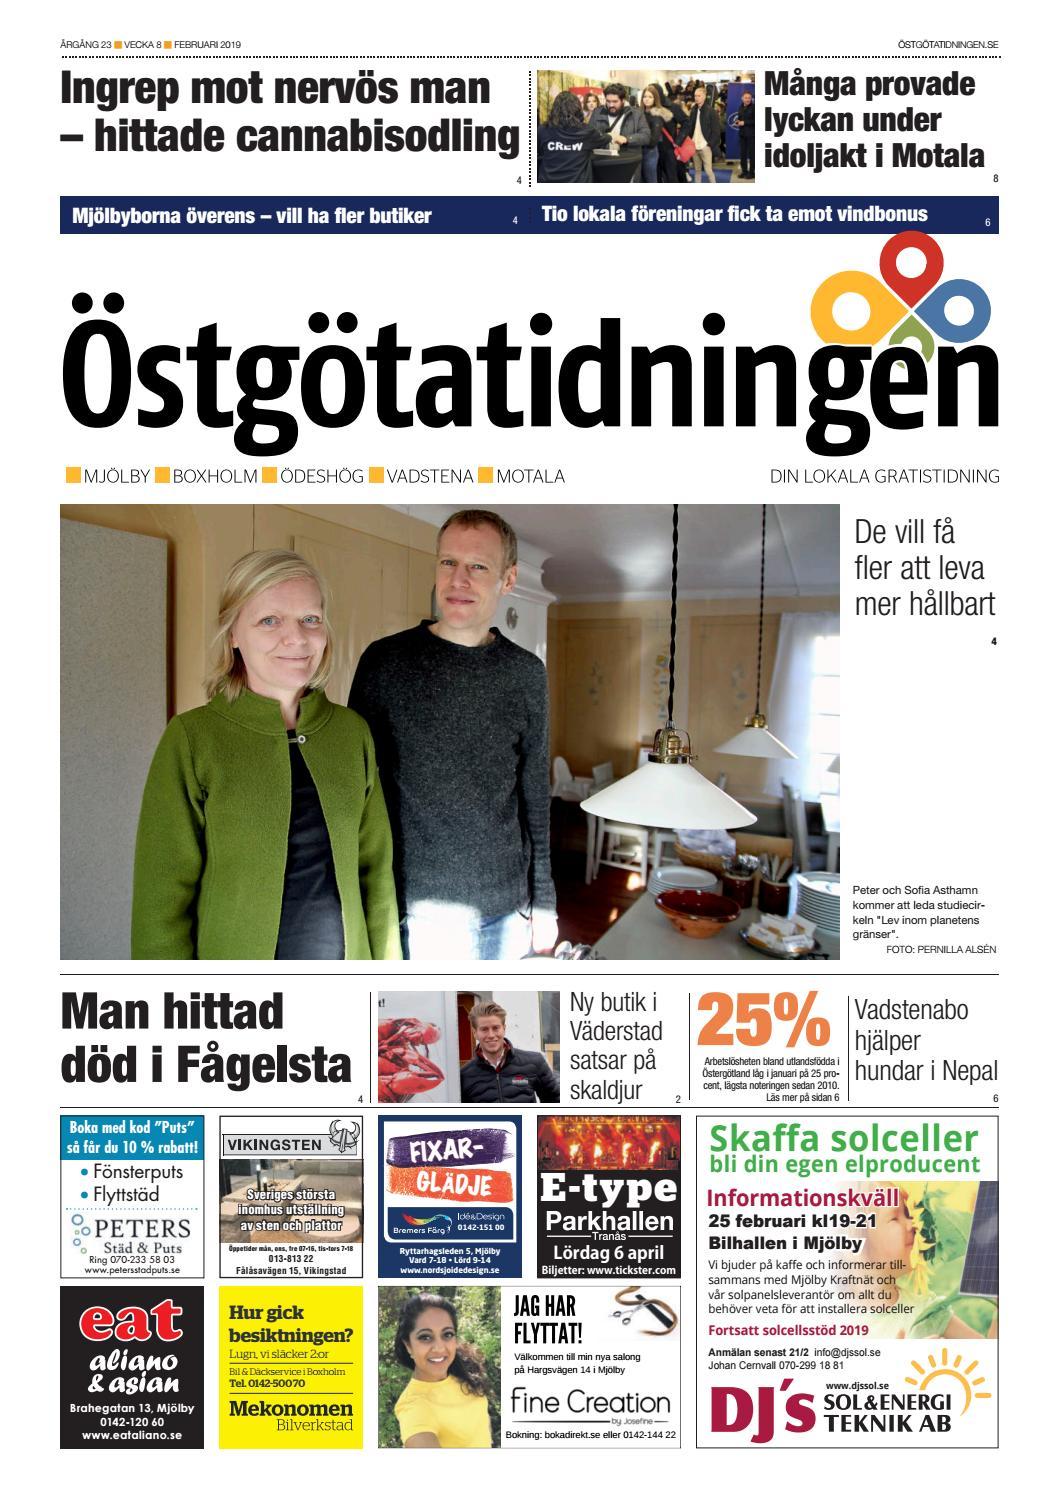 Mattias Johansson, stbacken 207, Alsen   redteksystems.net